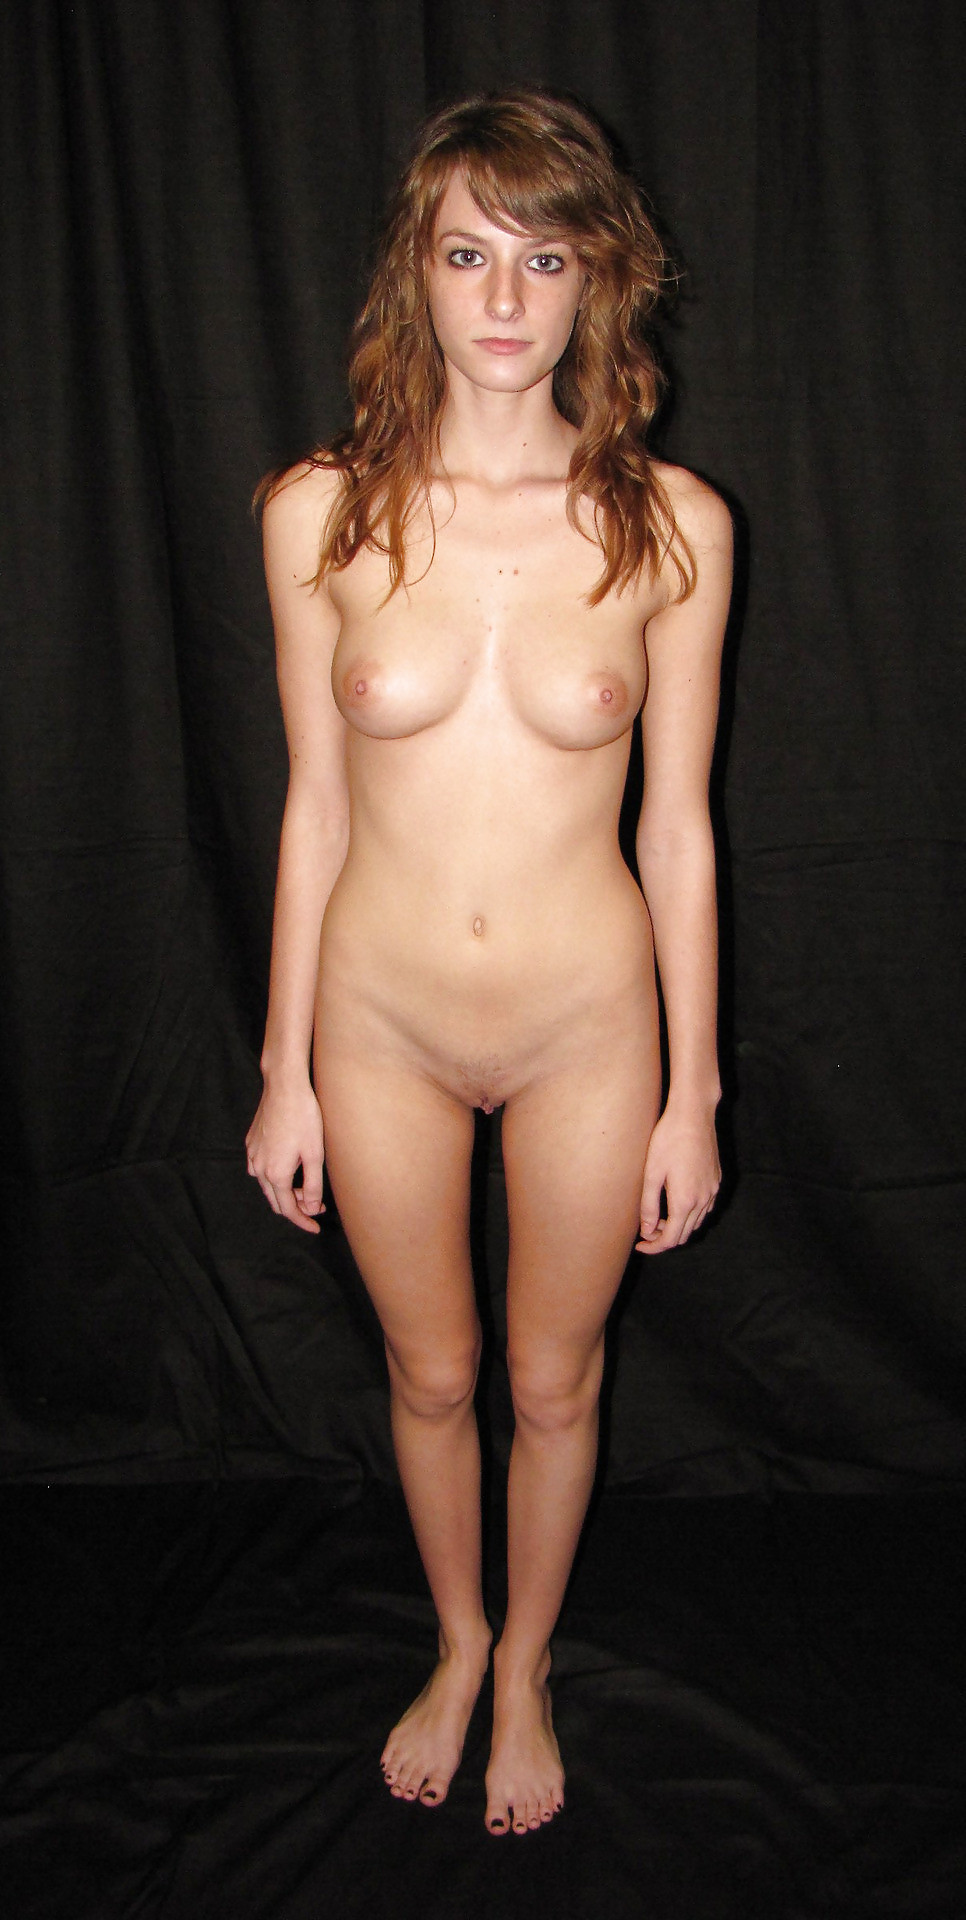 Russian Teen Drunk Nude